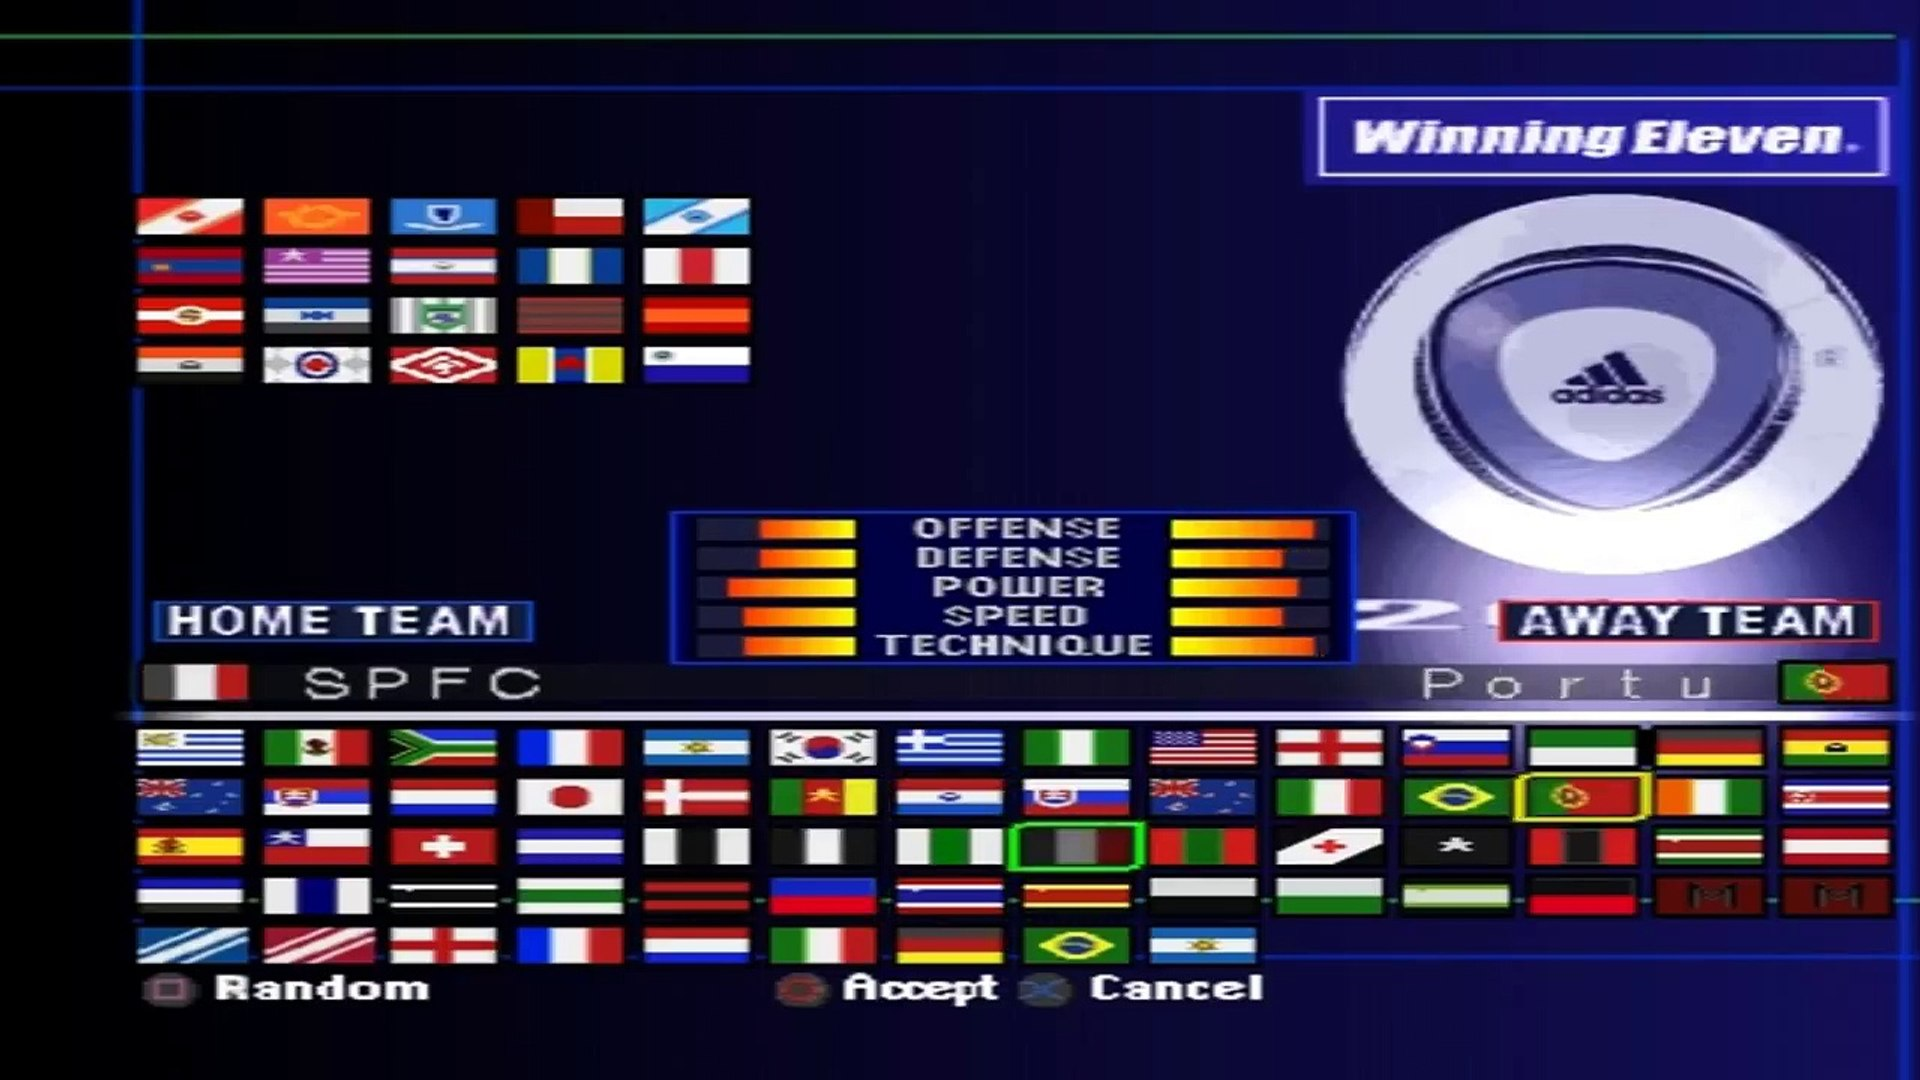 Winning Eleven new - Brasileirão (We2002) on pSX v1 13 - Playstation  (PSOne) Emulator